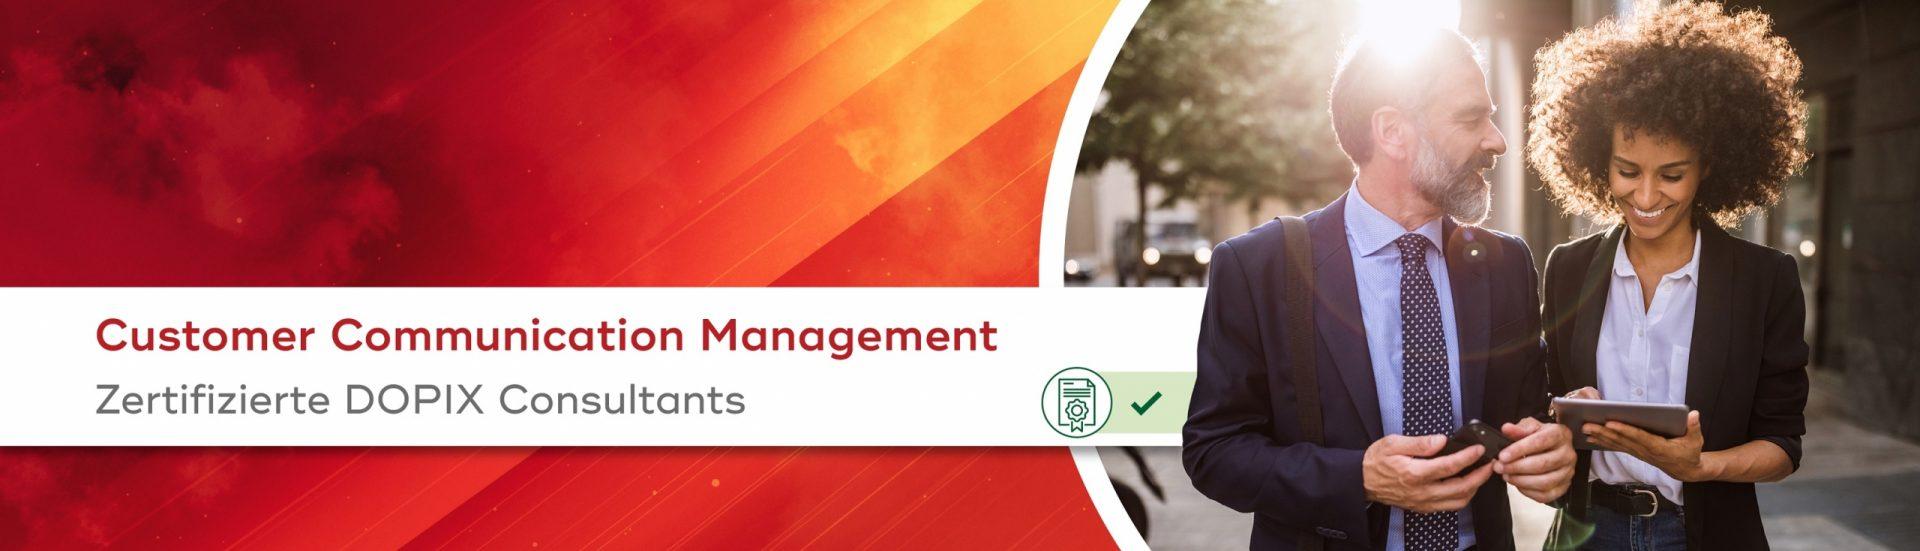 Grafik Customer Communication Management